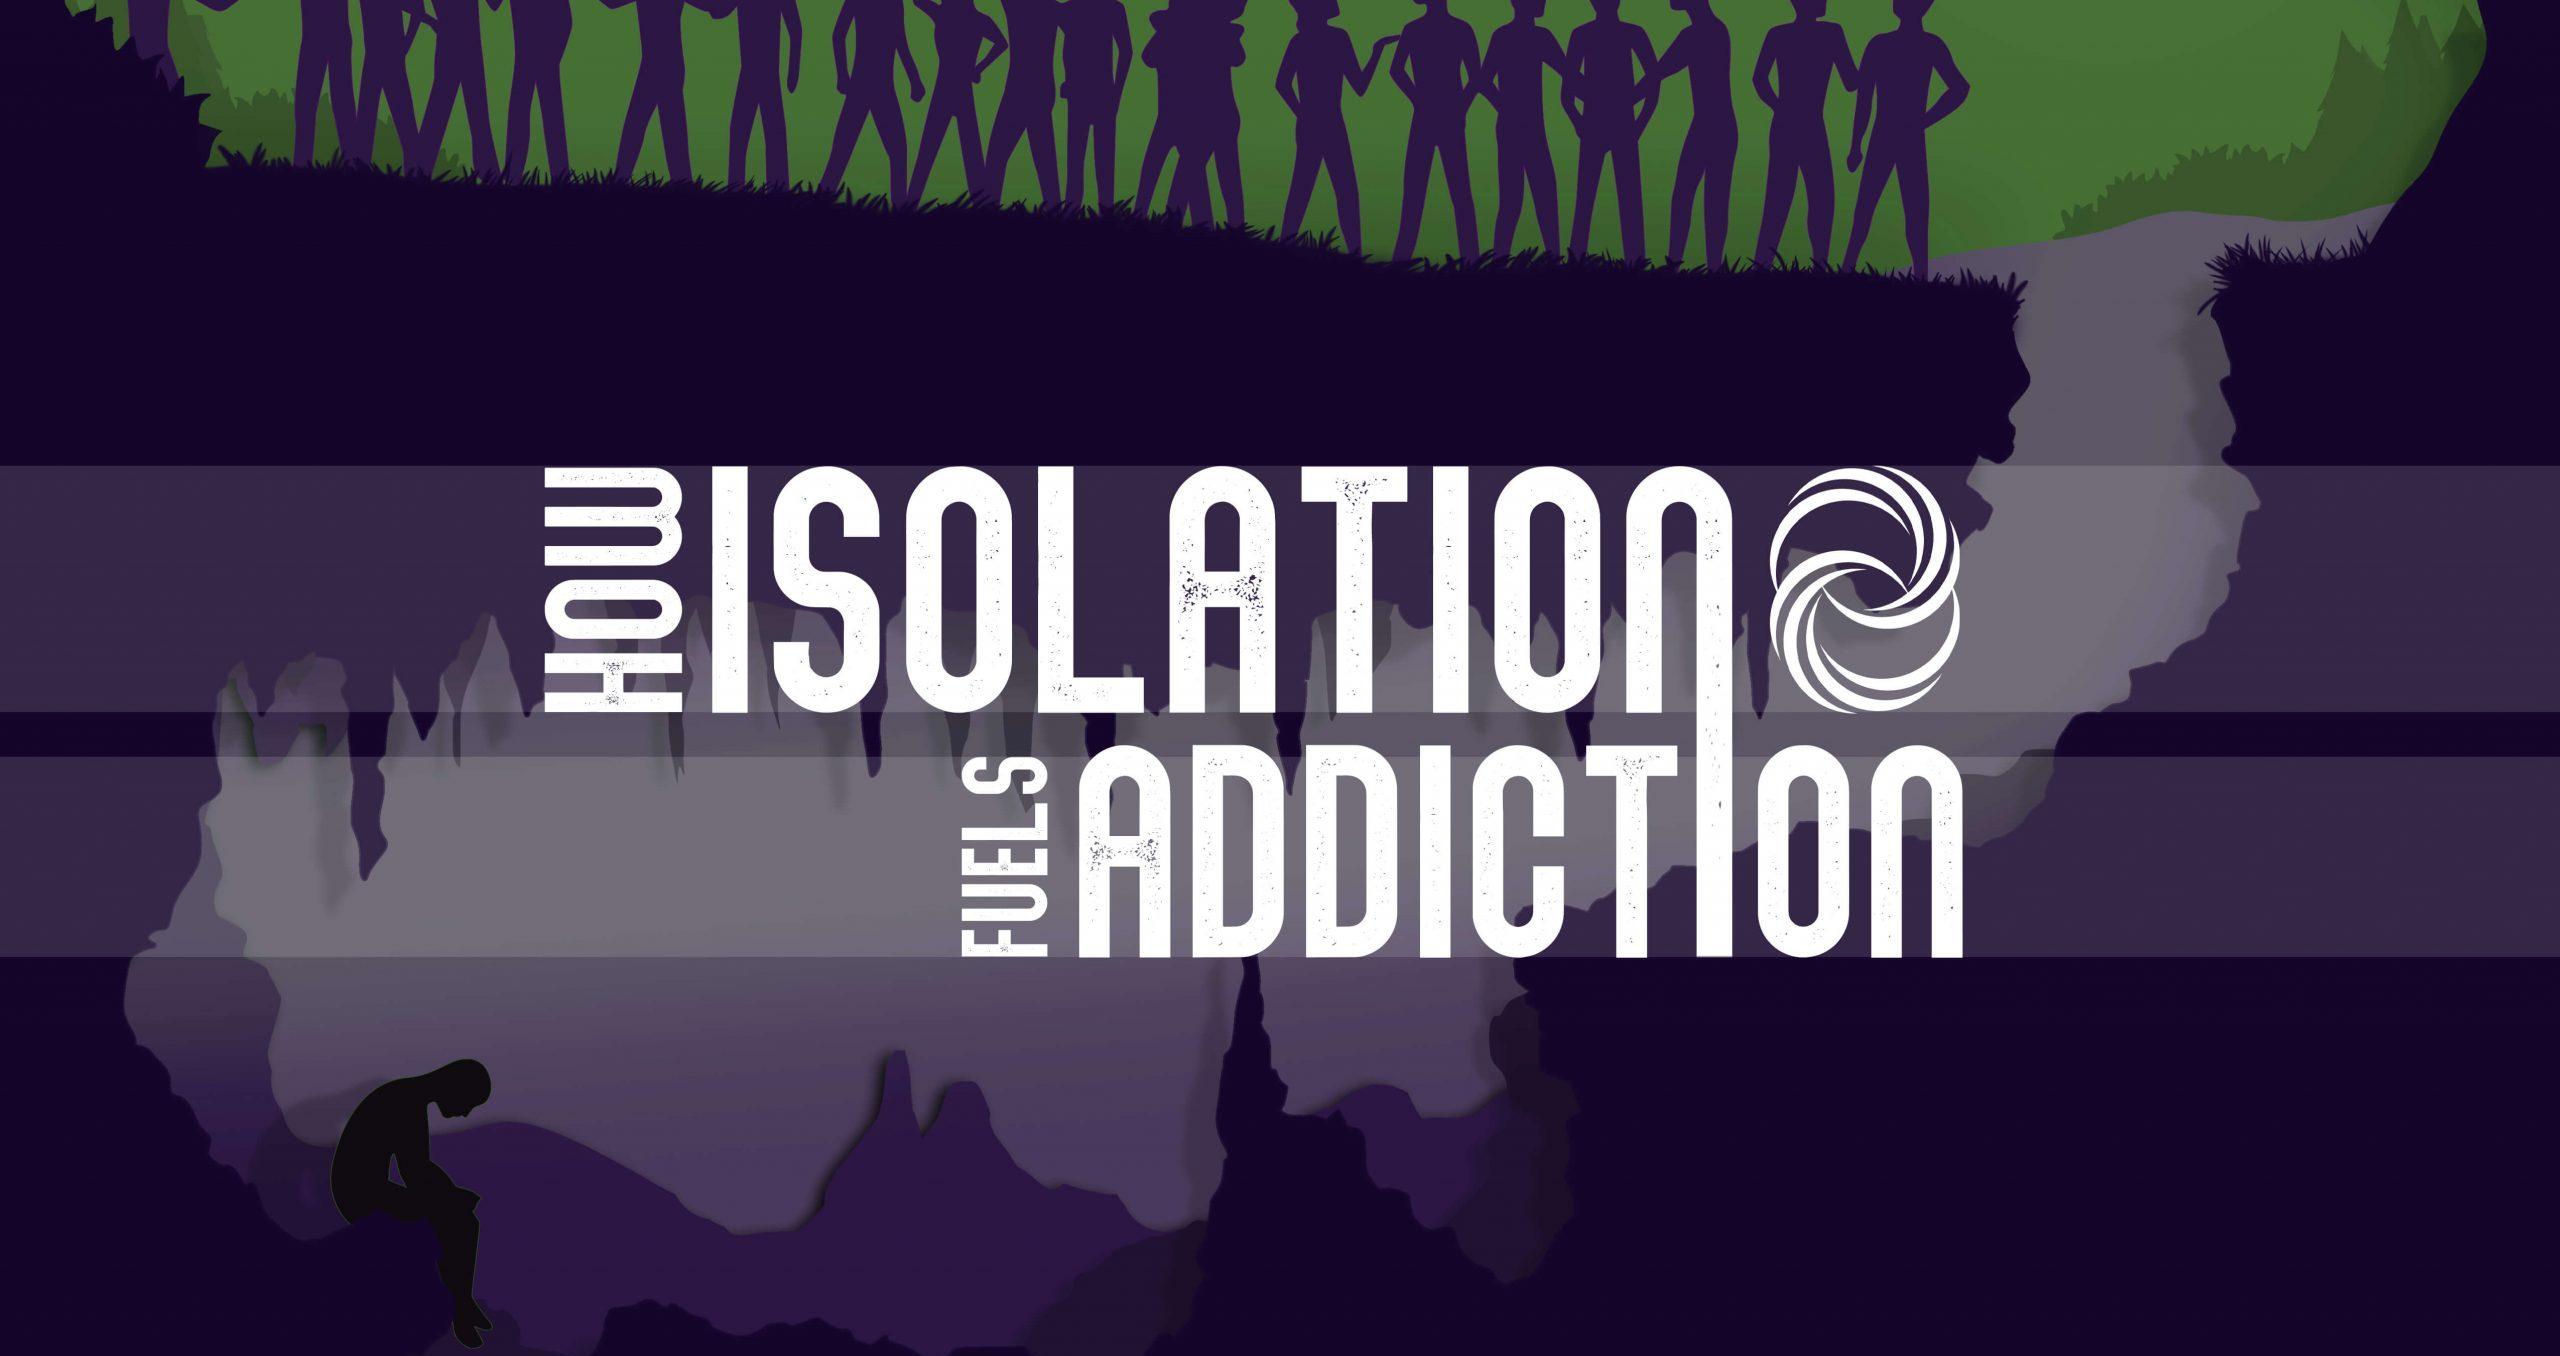 Isolation and addiction illustration